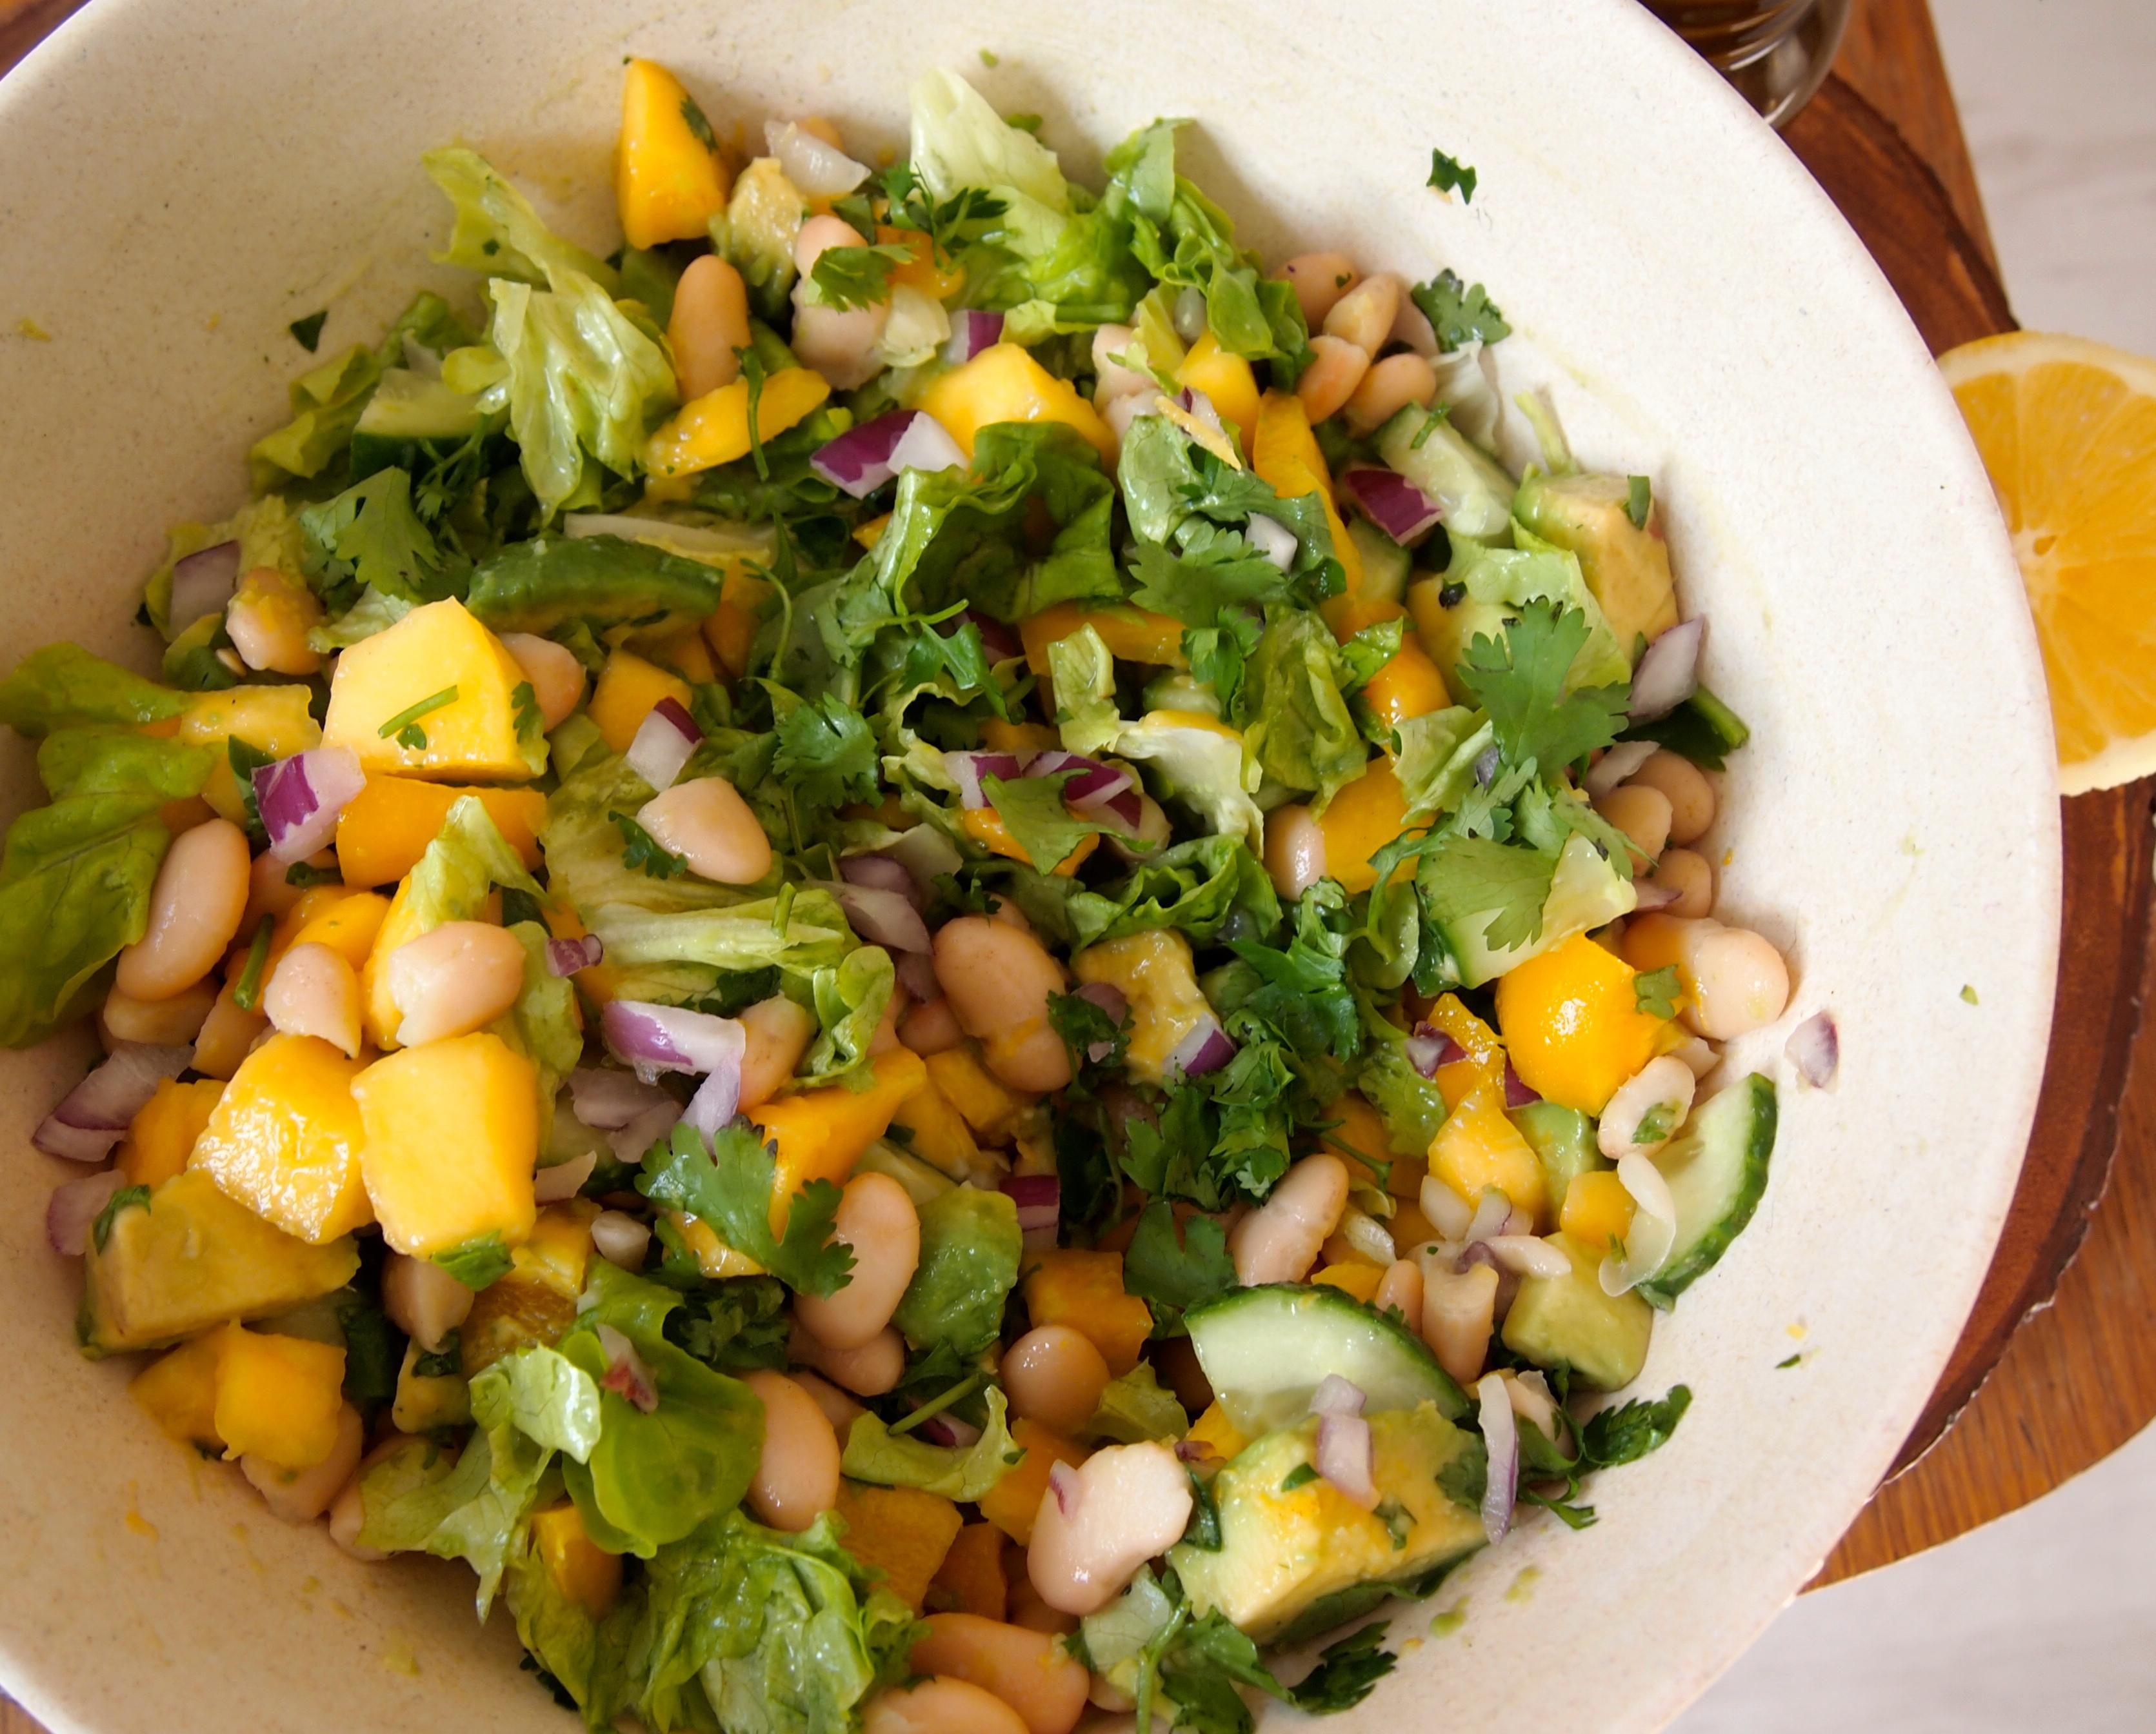 Recept: zomerse salade met mango, avocado en bonen | De ...